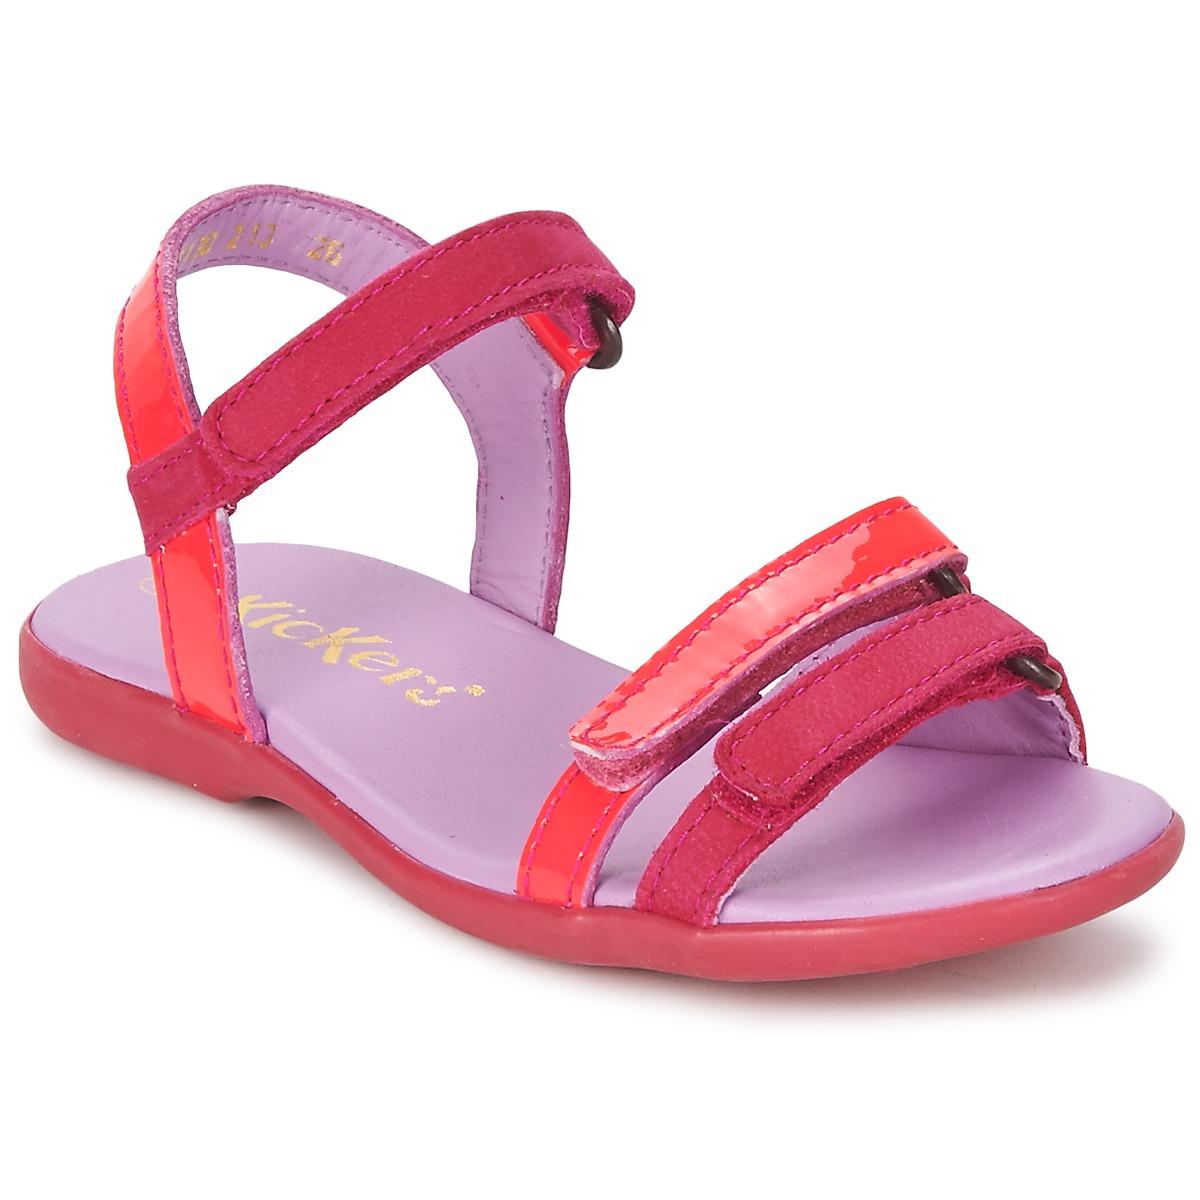 Sandale Kickers ARCENCIEL Fuchsia / Rose / Fluo